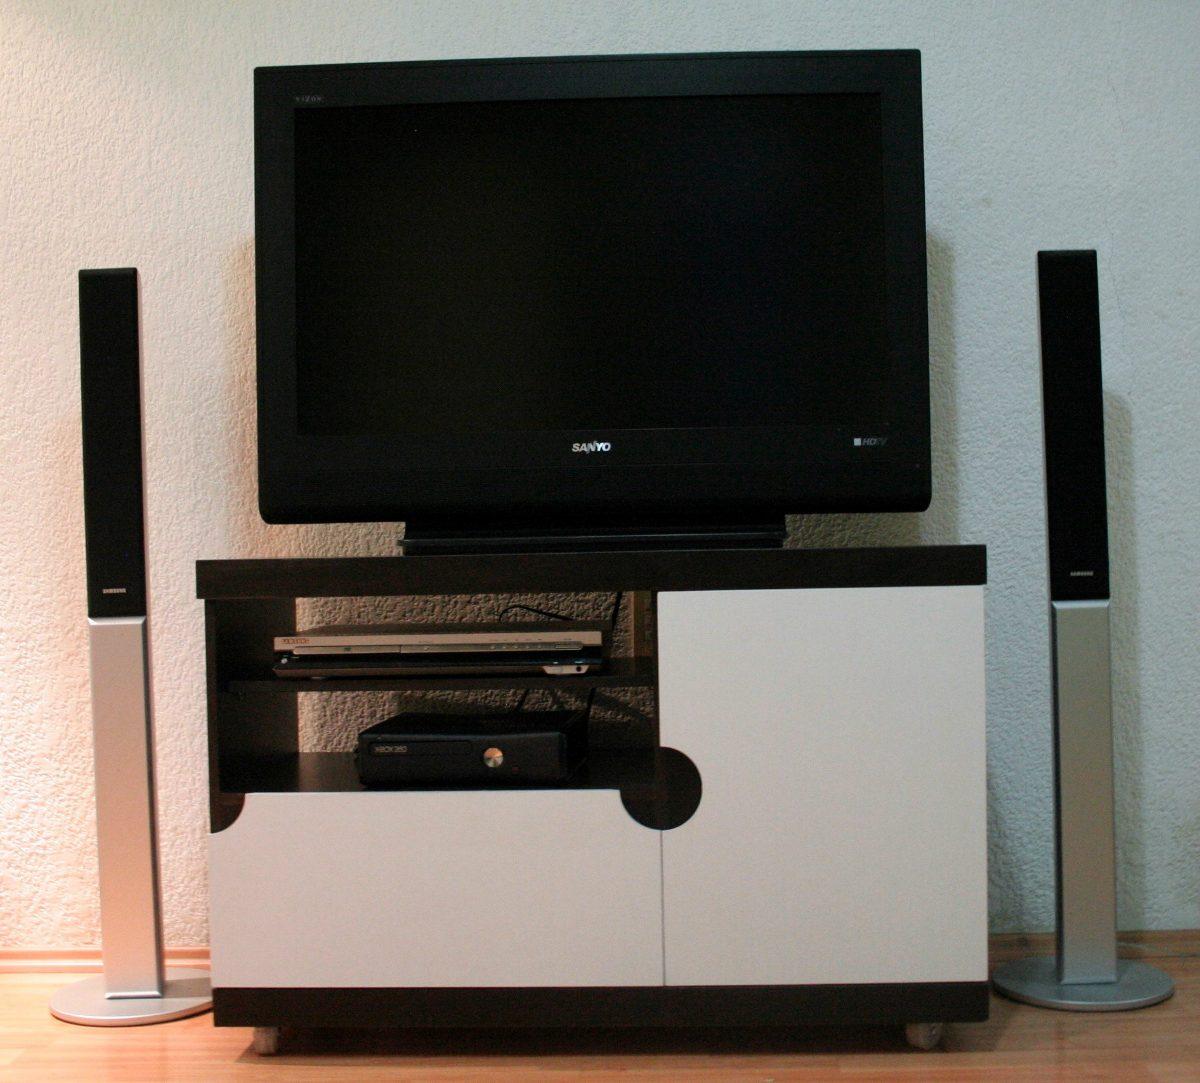 Decorar cuartos con manualidades muebles para pantalla de china imagenes - Muebles para televisores pantalla plana ...